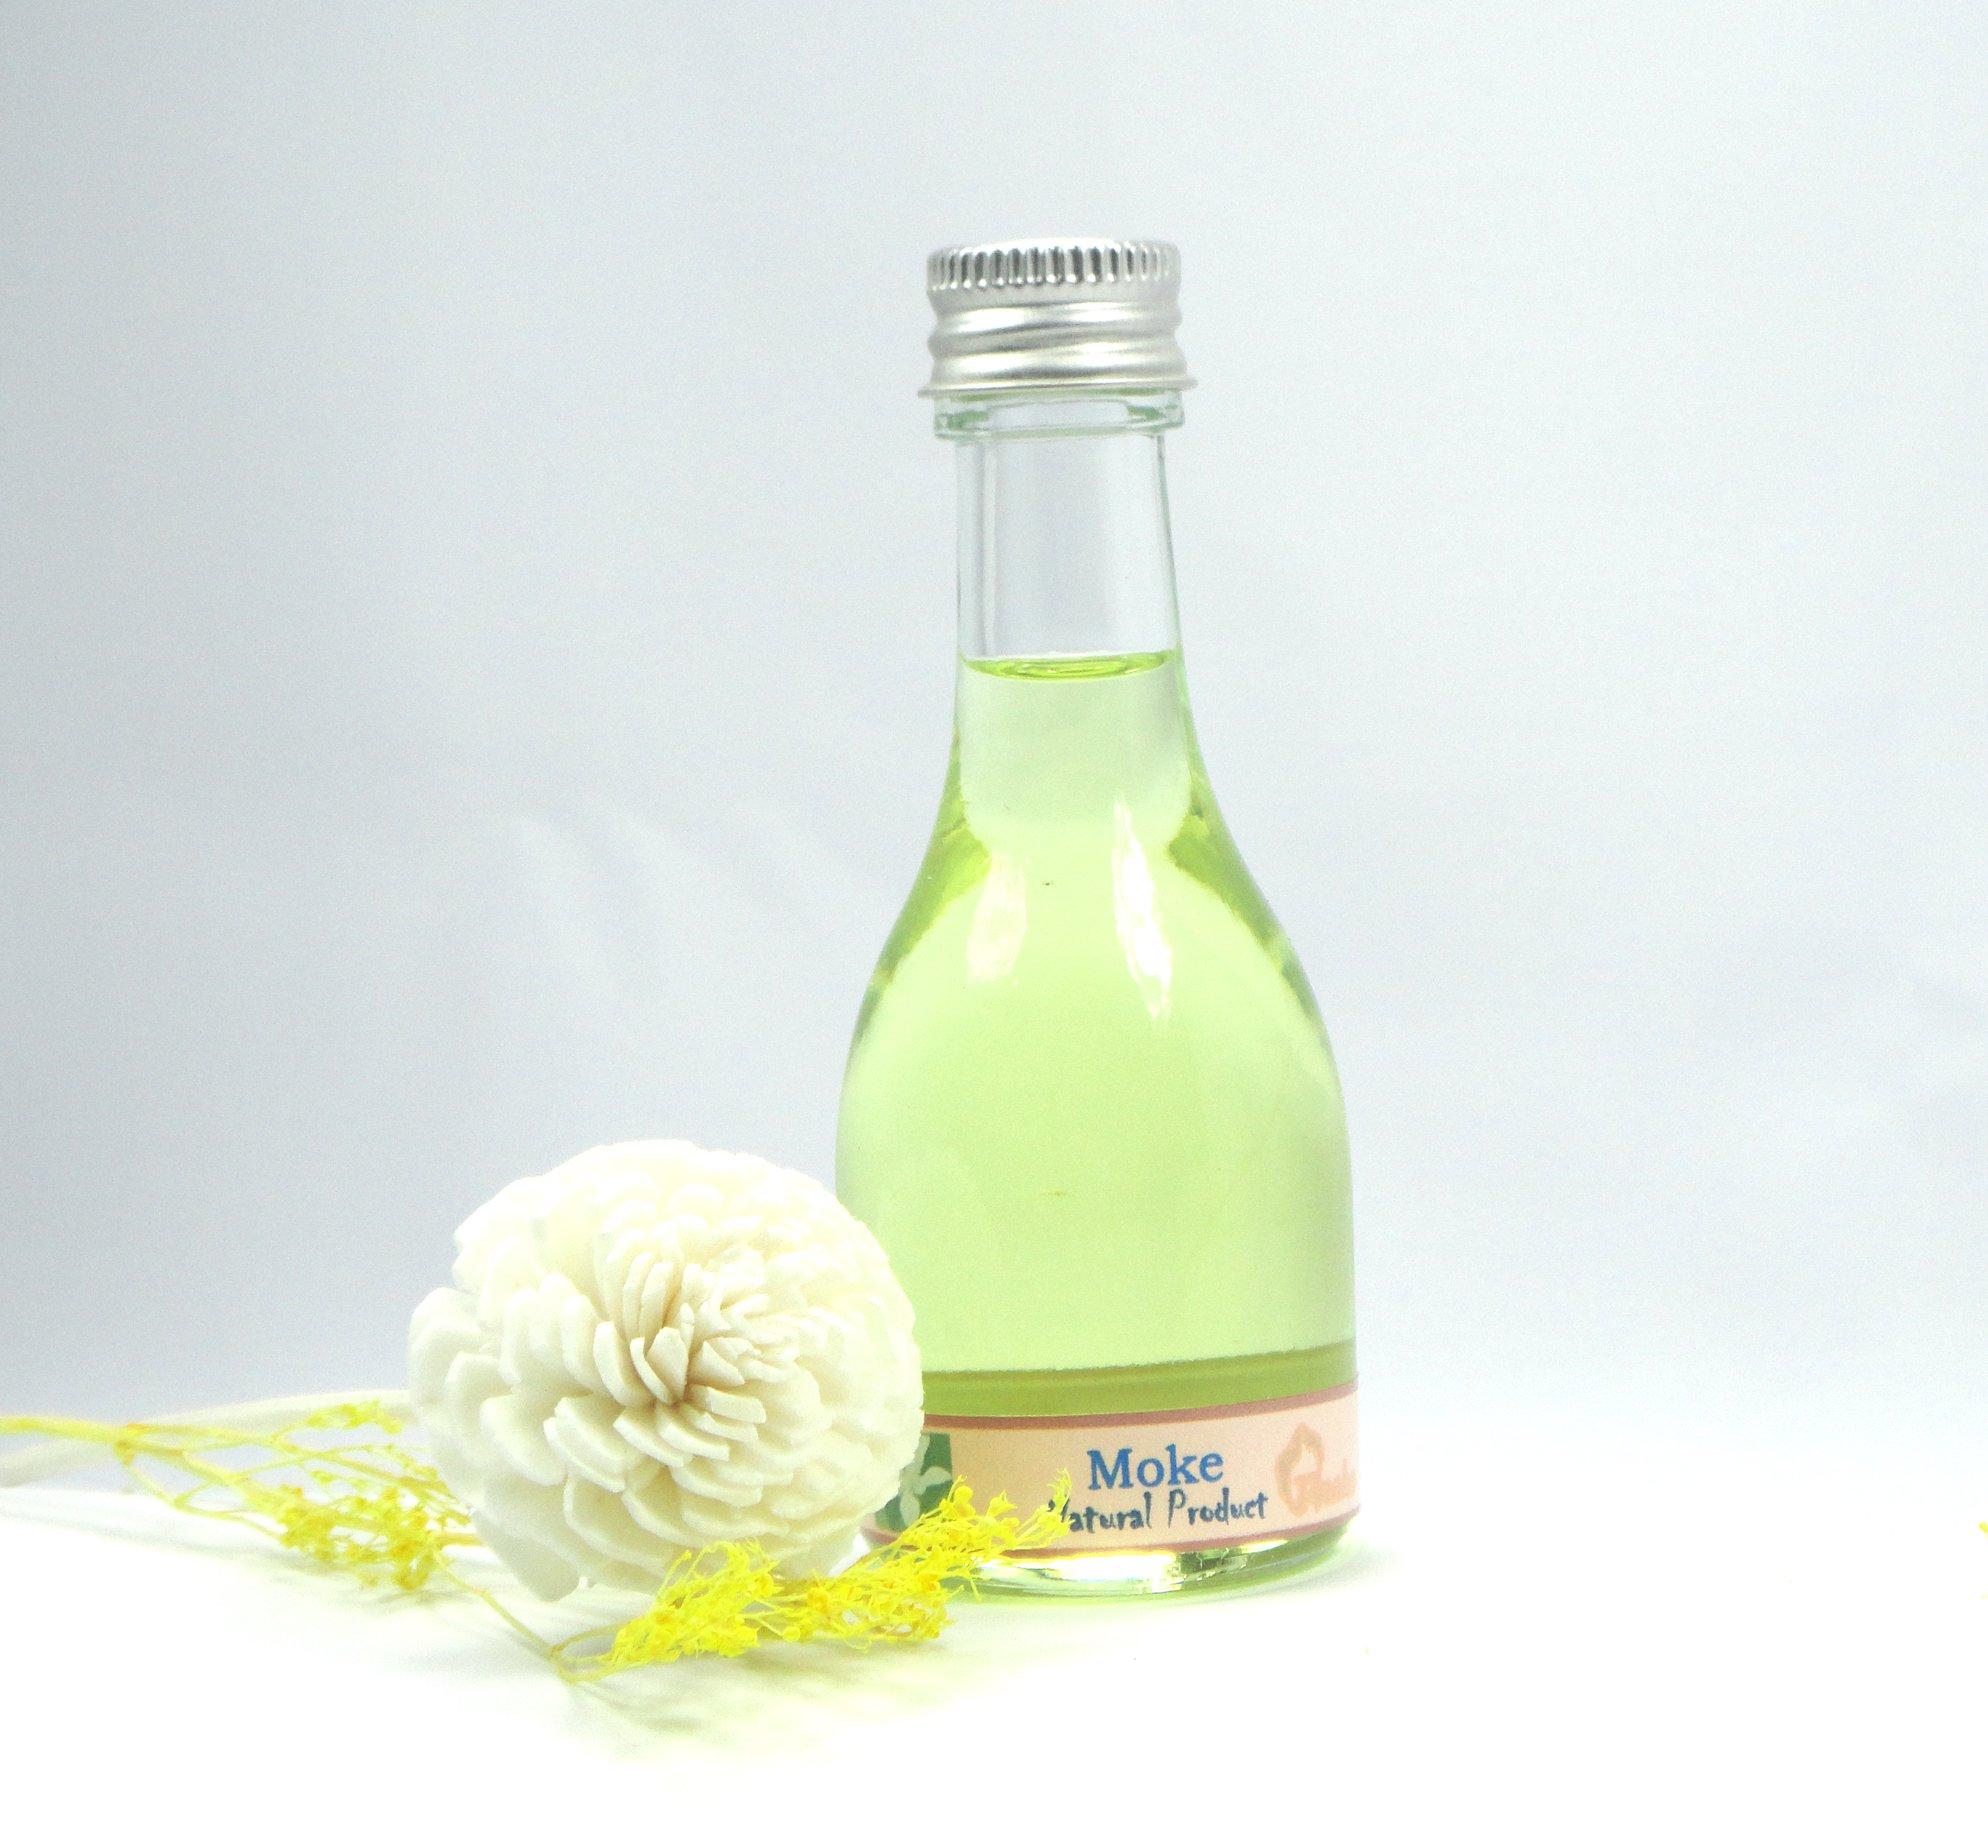 MOKE Reed Diffuser Fragrance Essential Oil Reed Diffuser Moke Flower 30ml./1 Oz